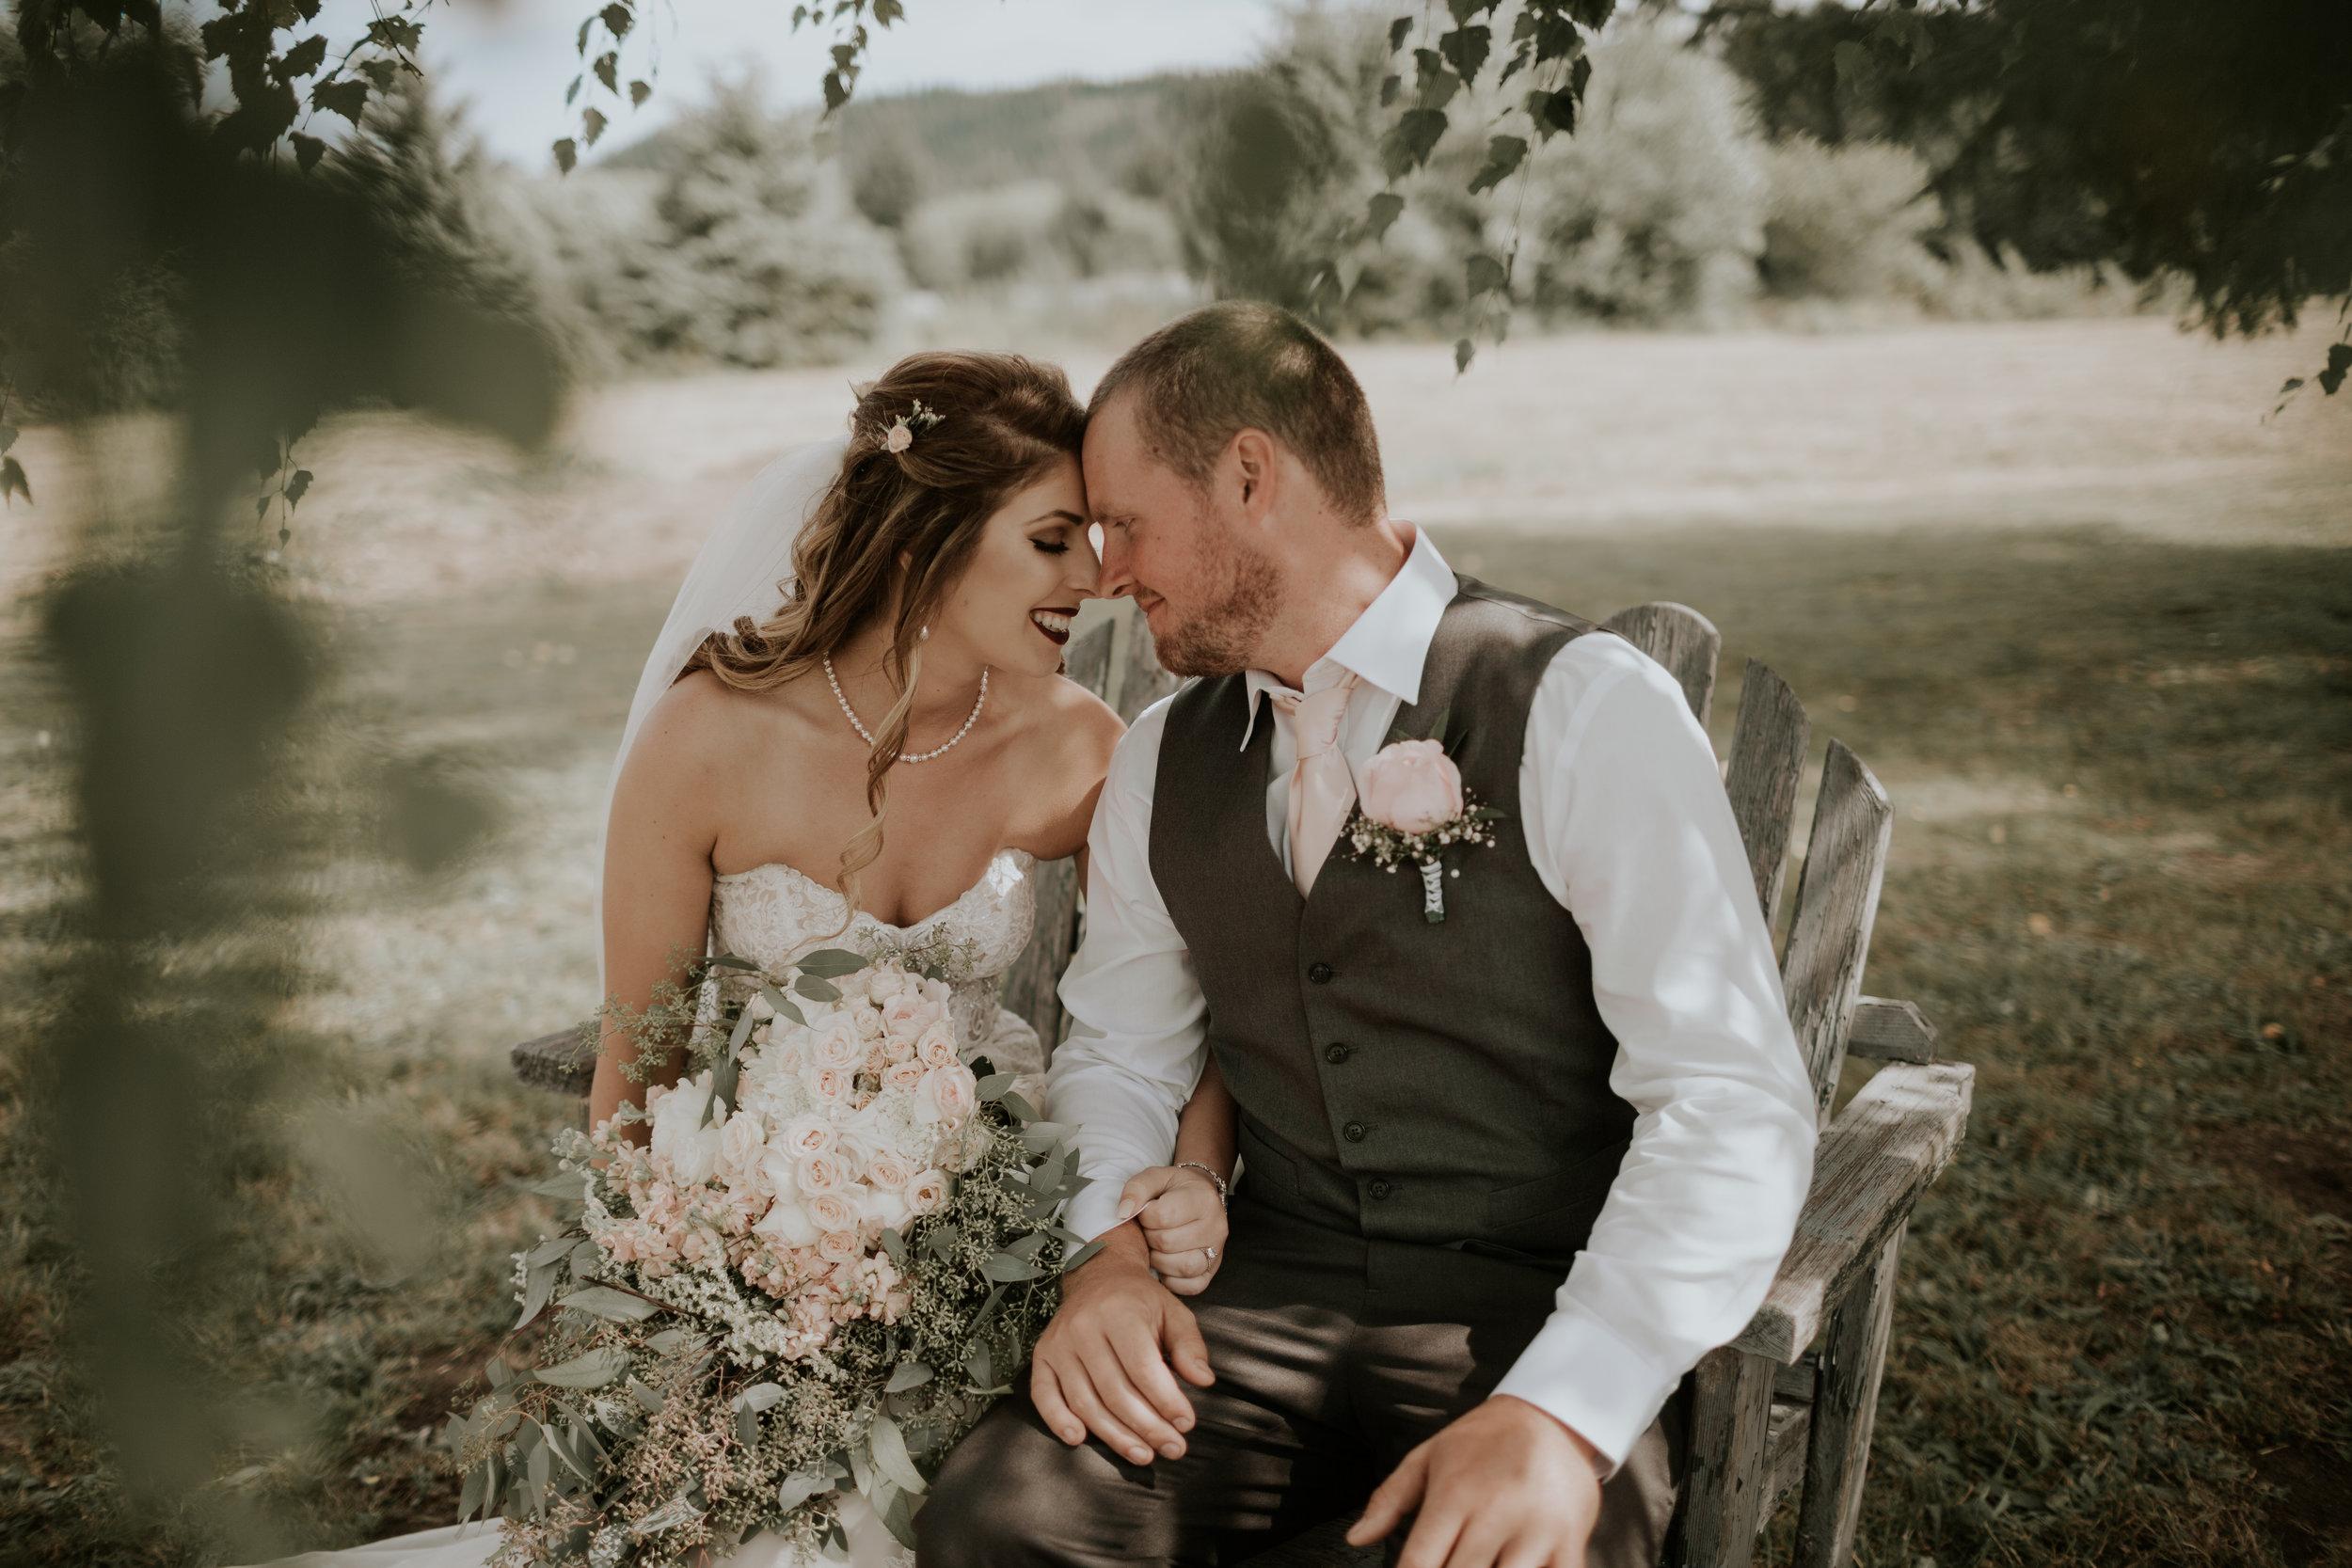 Olympic-Peninsula-Wedding-Photographer-PNW-Forks-Port-Angeles-Kayla-Dawn-Photography-engagement-Olympic-National-Park-142.jpg